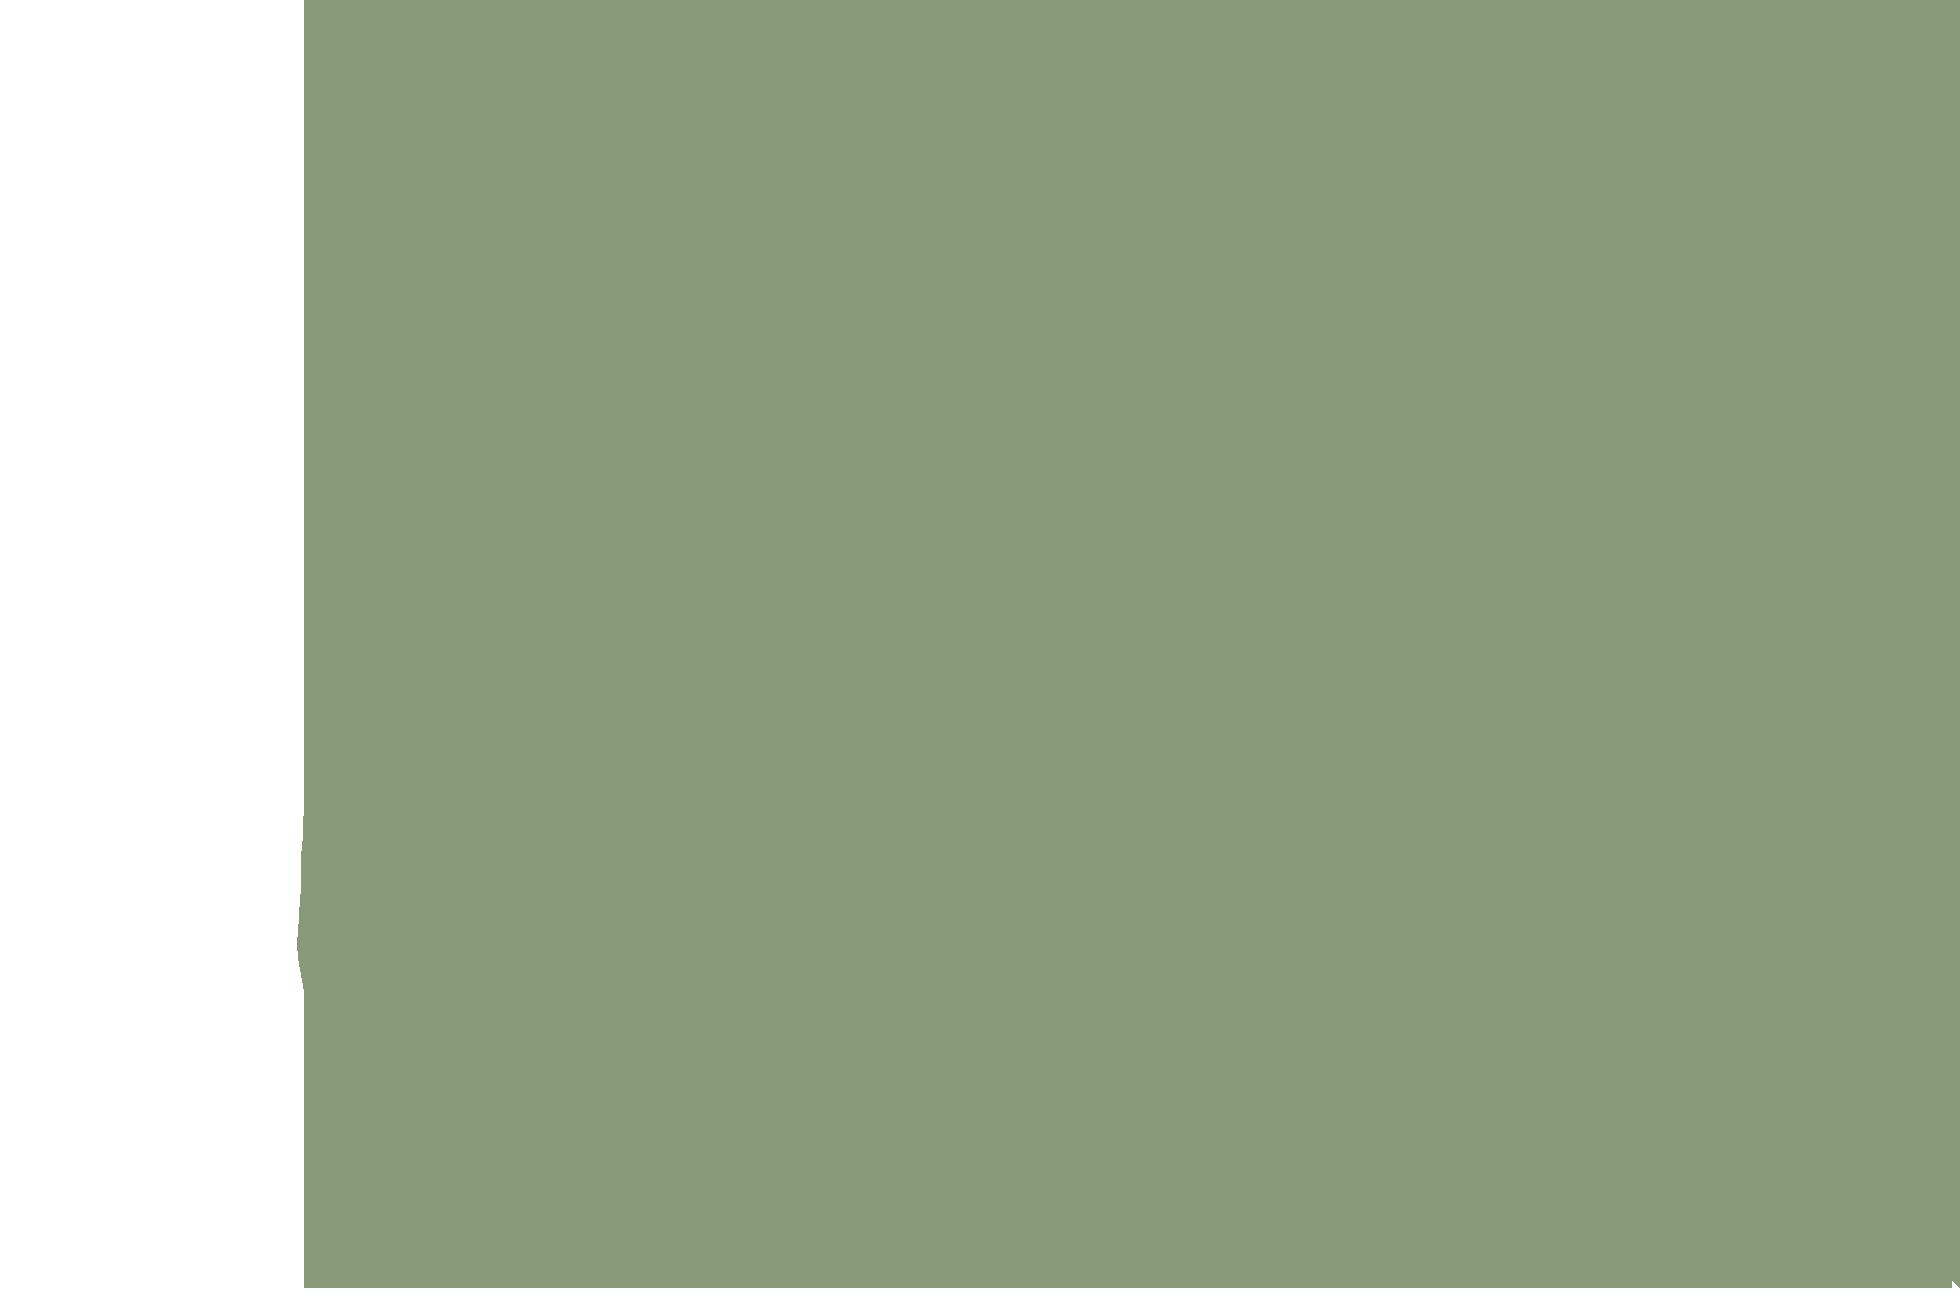 Blob 1.1-dark green.png